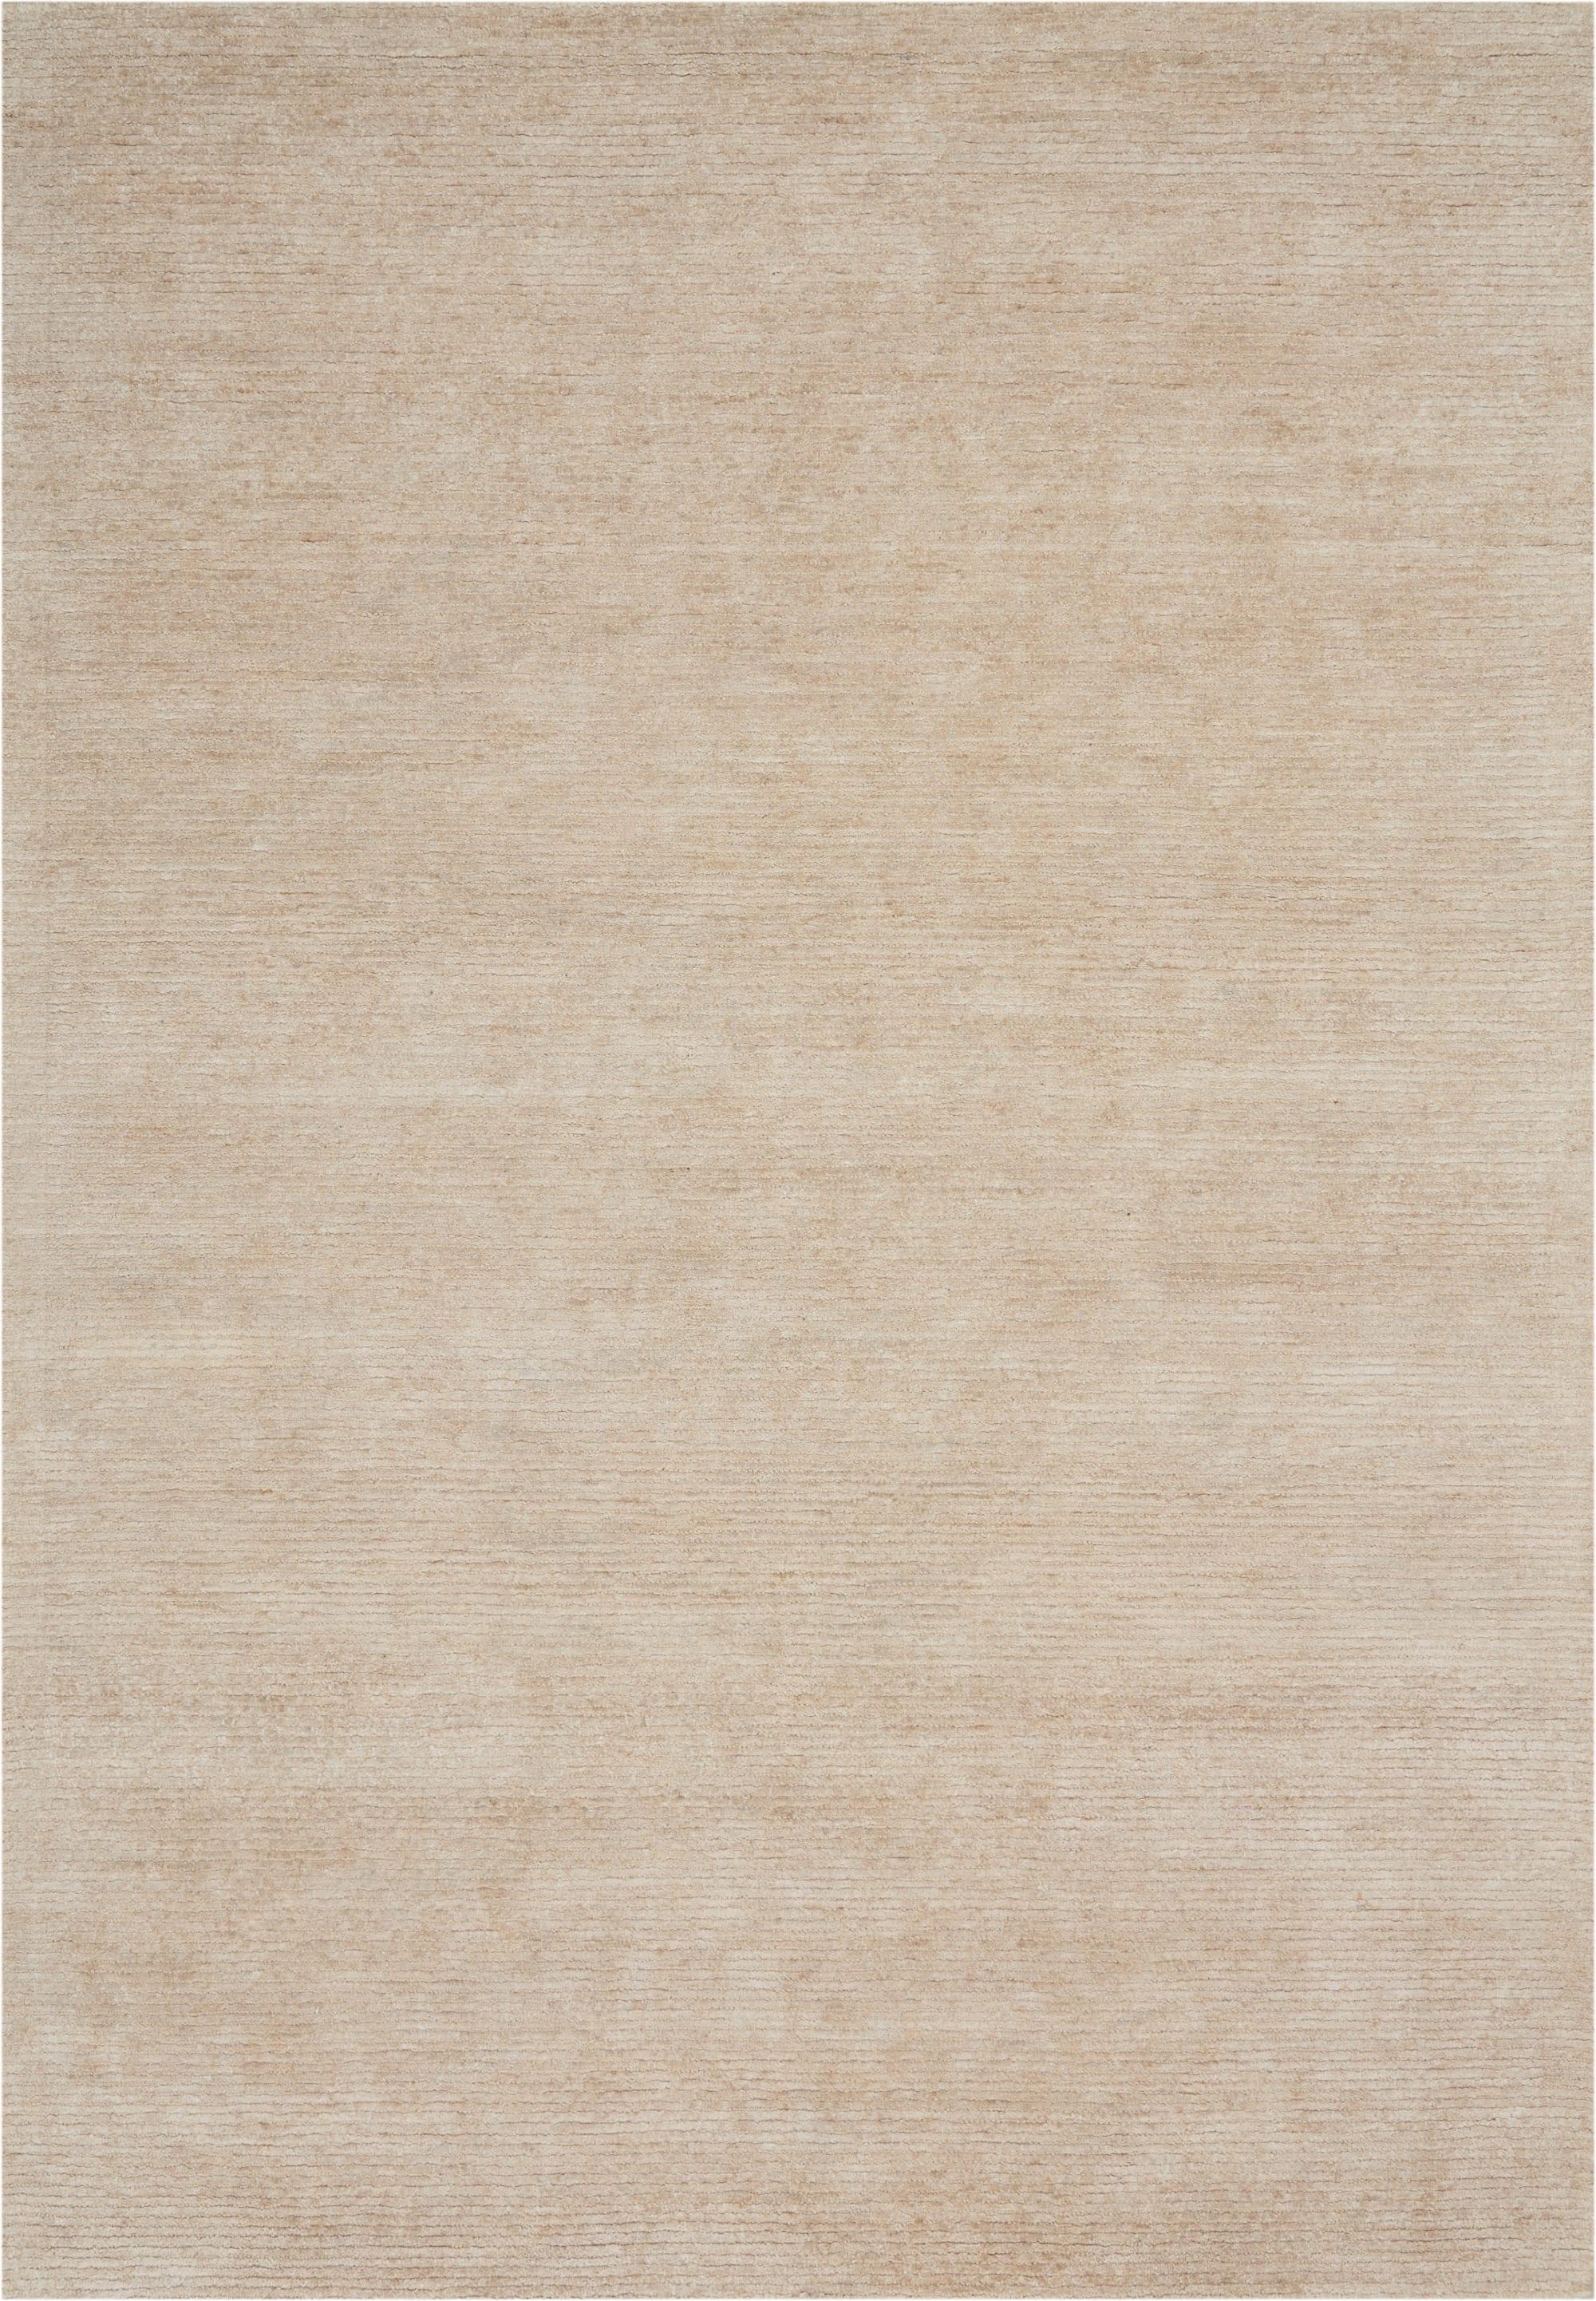 Weston Rug WES01 Linen